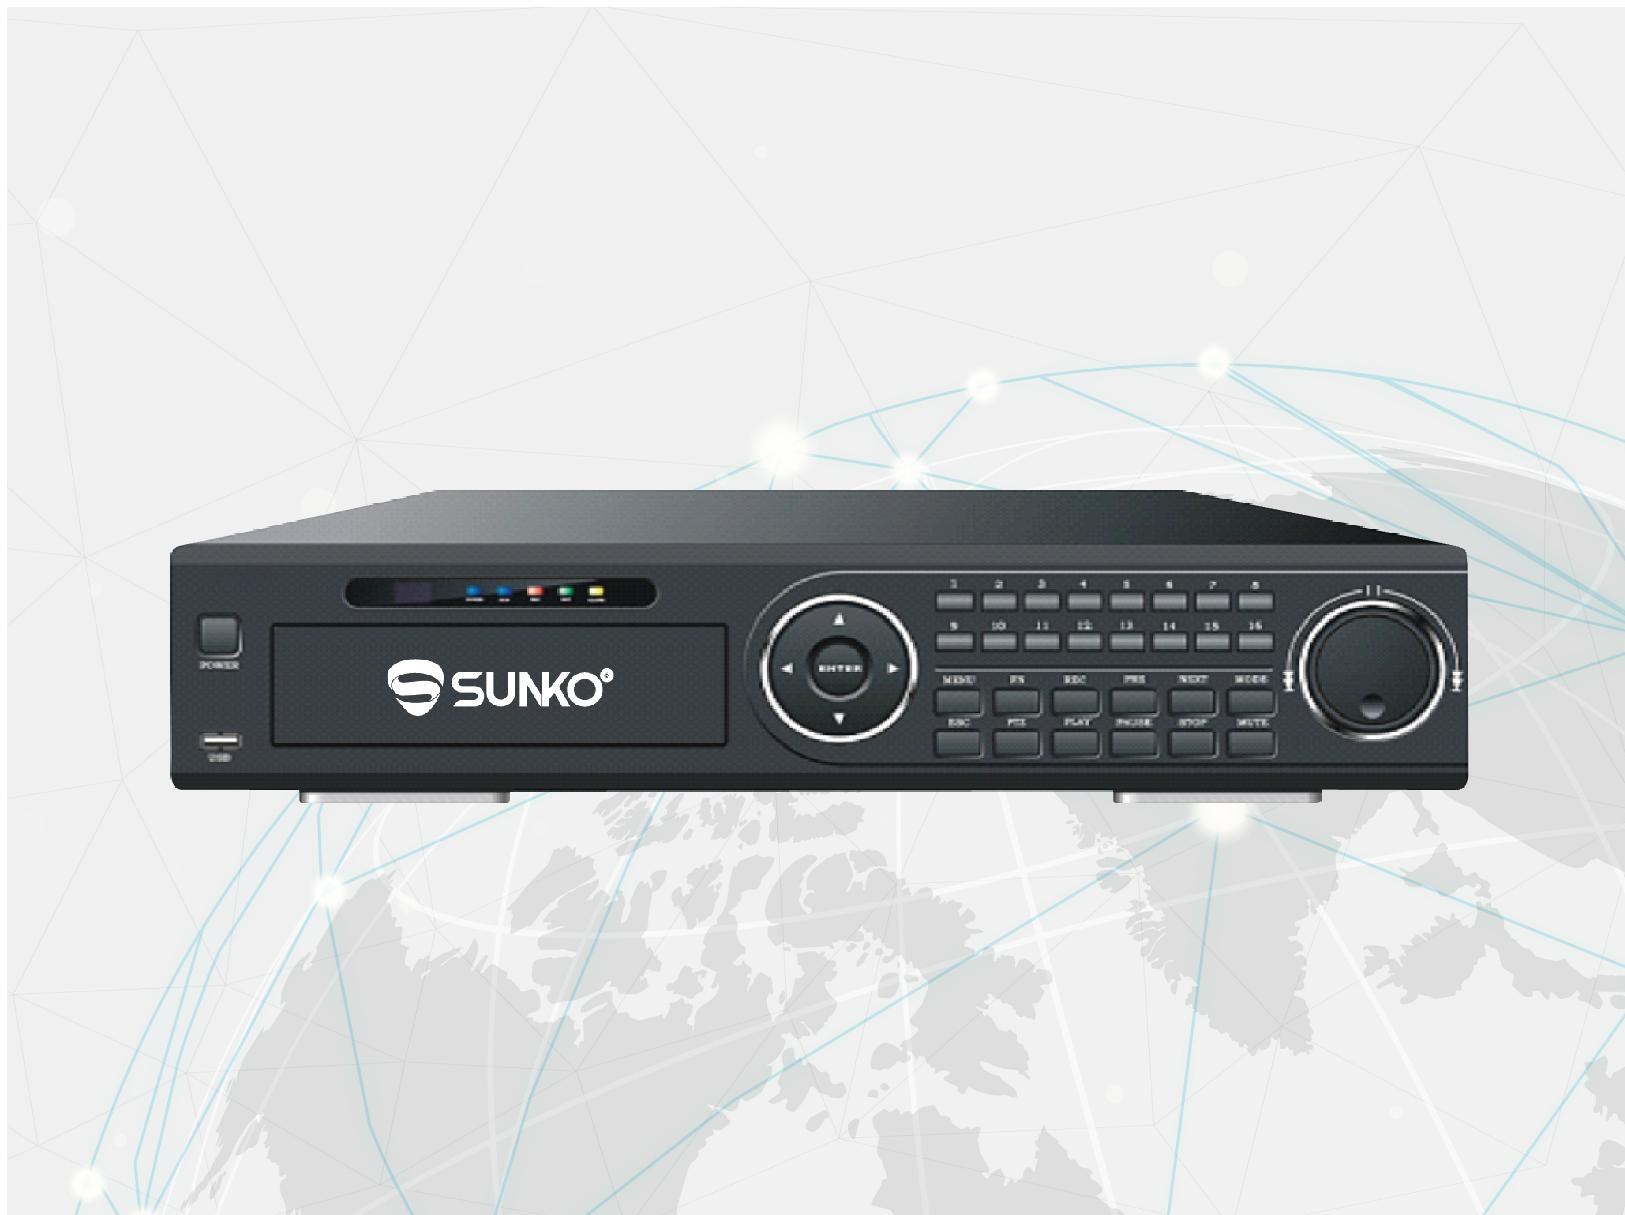 MODEL: SK-NV132H4-D4